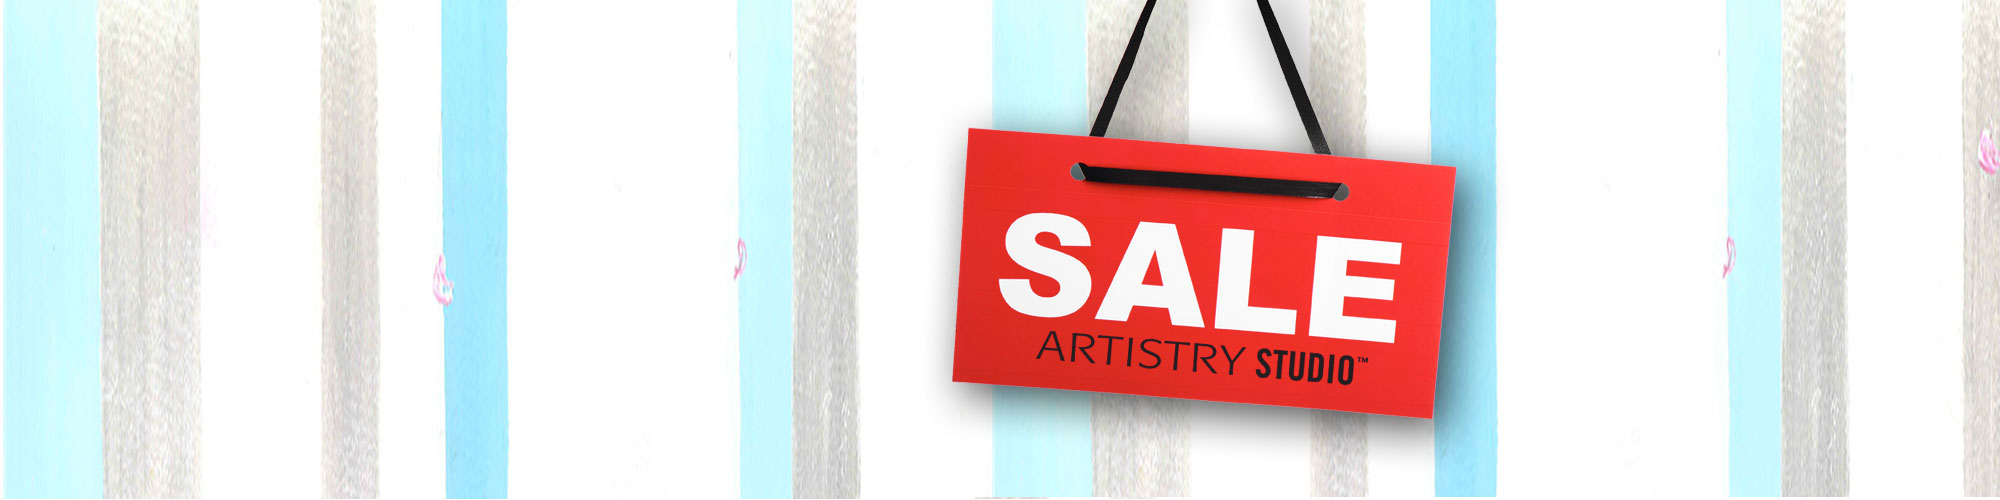 ARTISTRY Studio clearance sale.